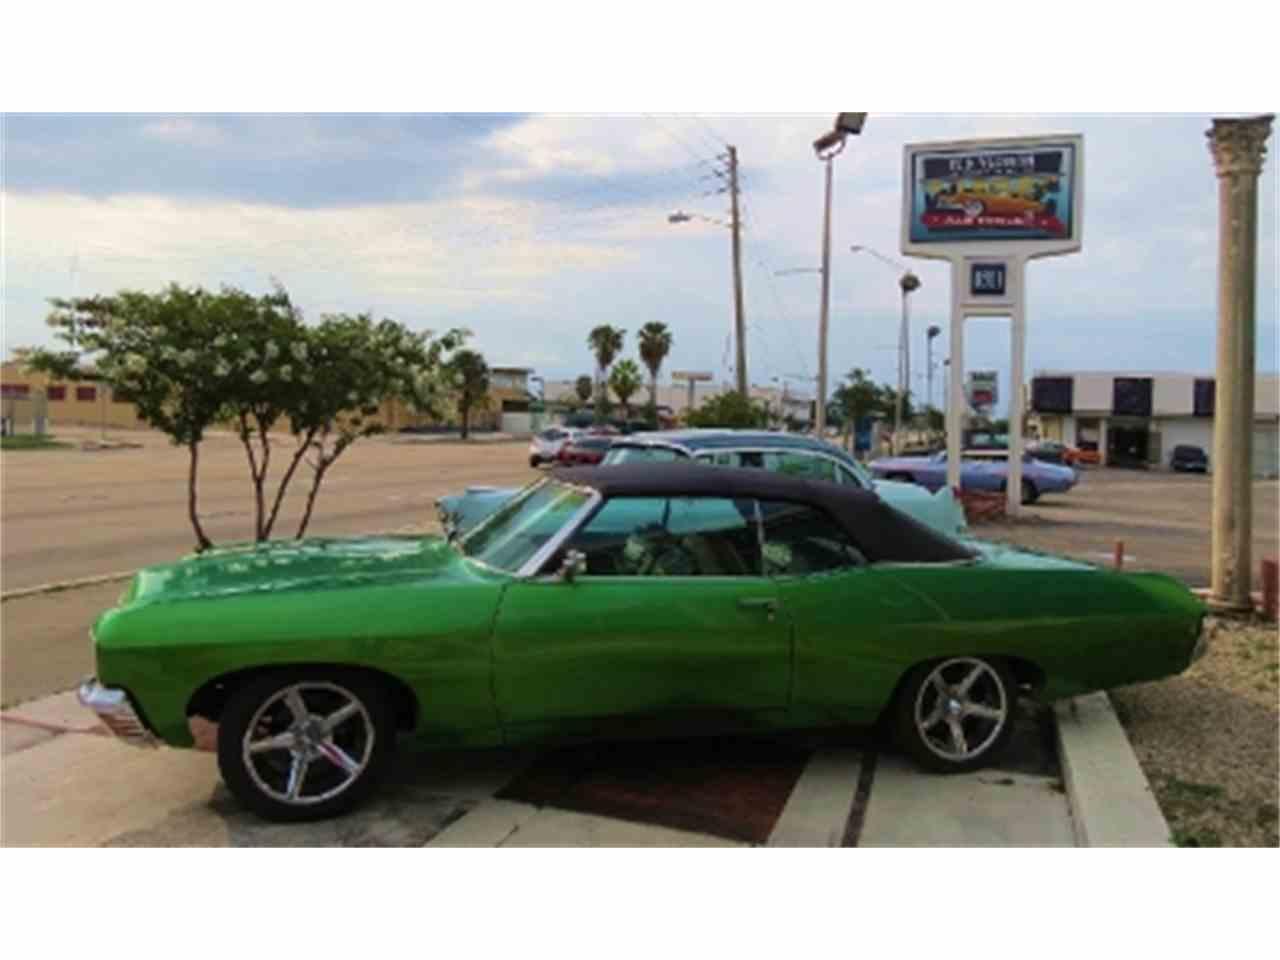 All Chevy chevy 1970 : 1970 Chevrolet Impala for Sale | ClassicCars.com | CC-641614